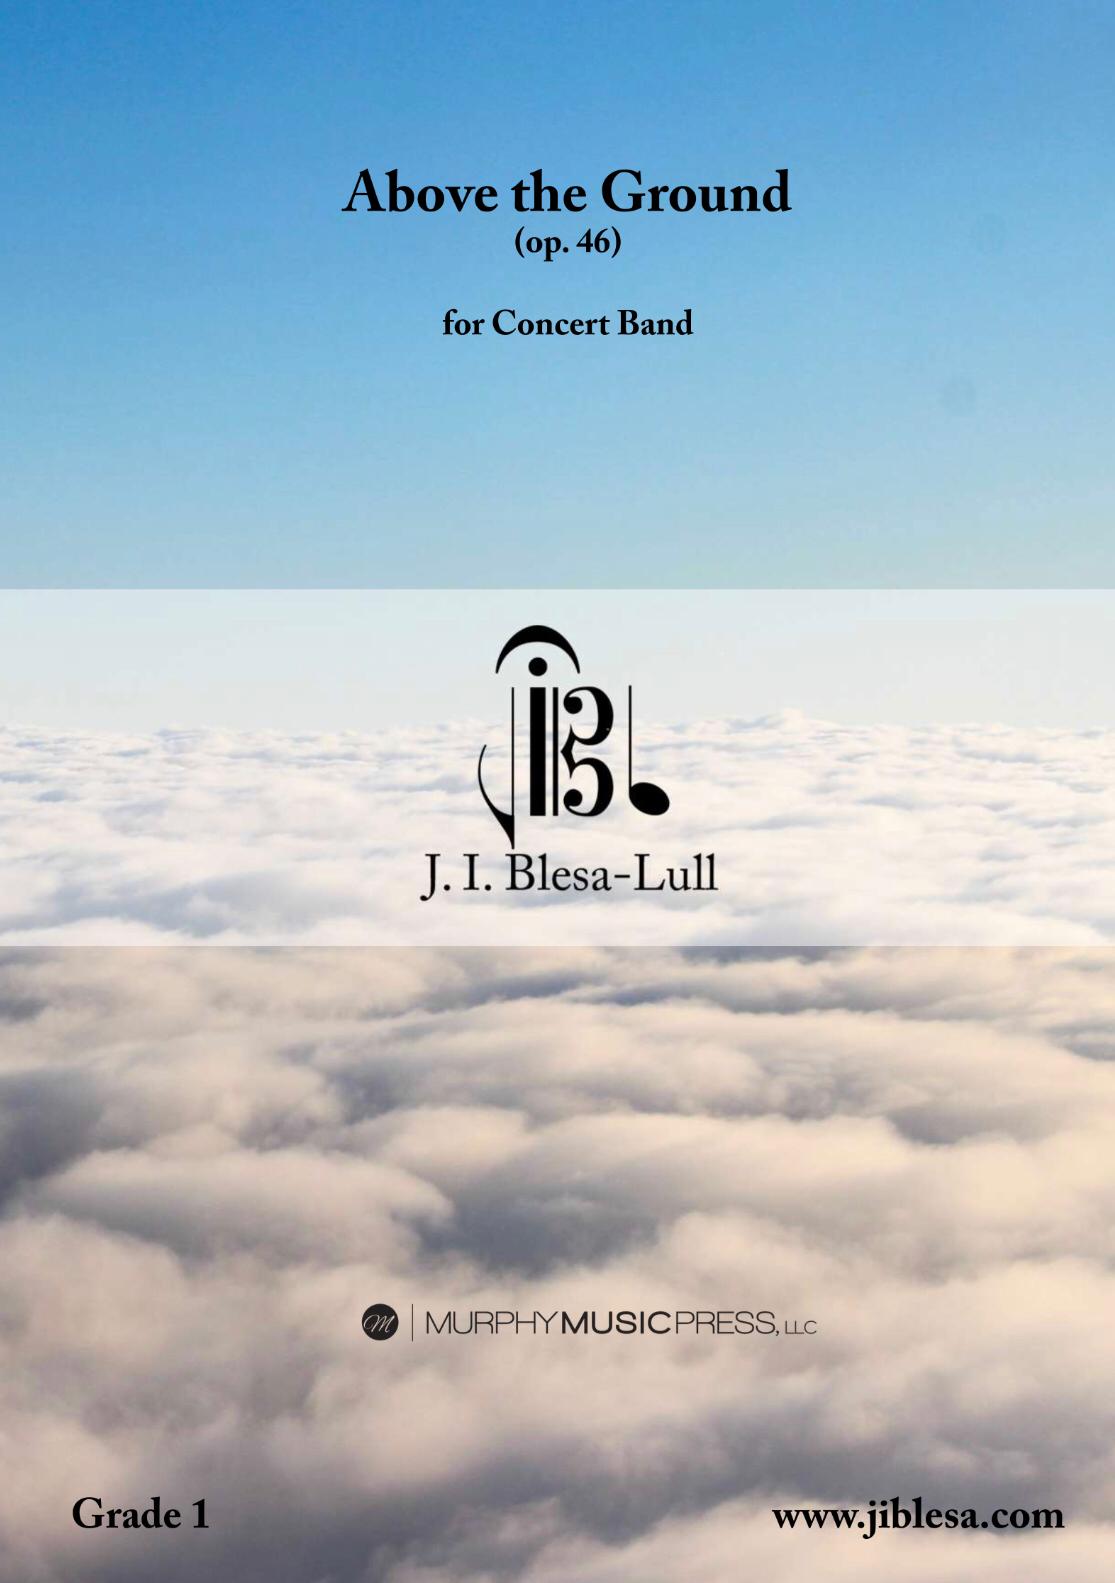 Above The Ground by Jose Ignacio Blesa-Lull